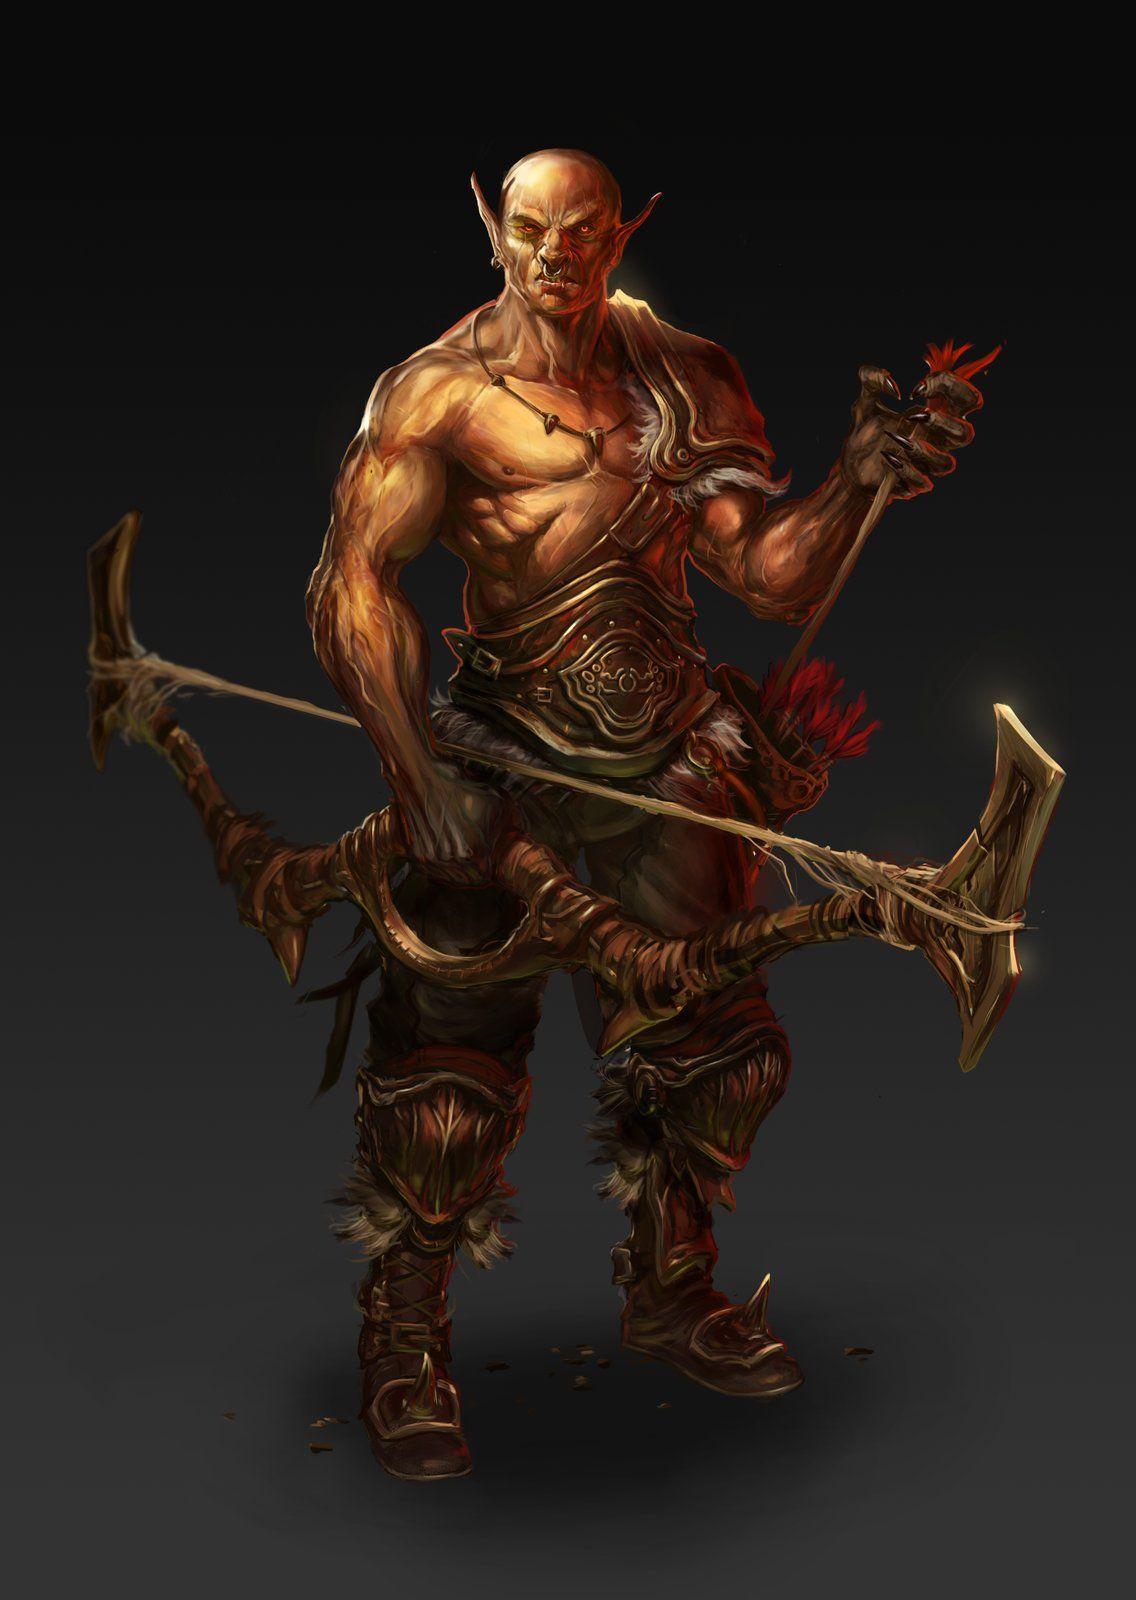 Orc Archer, Selver Dervisic | Warrior concept art, Epic art, Fantasy  characters